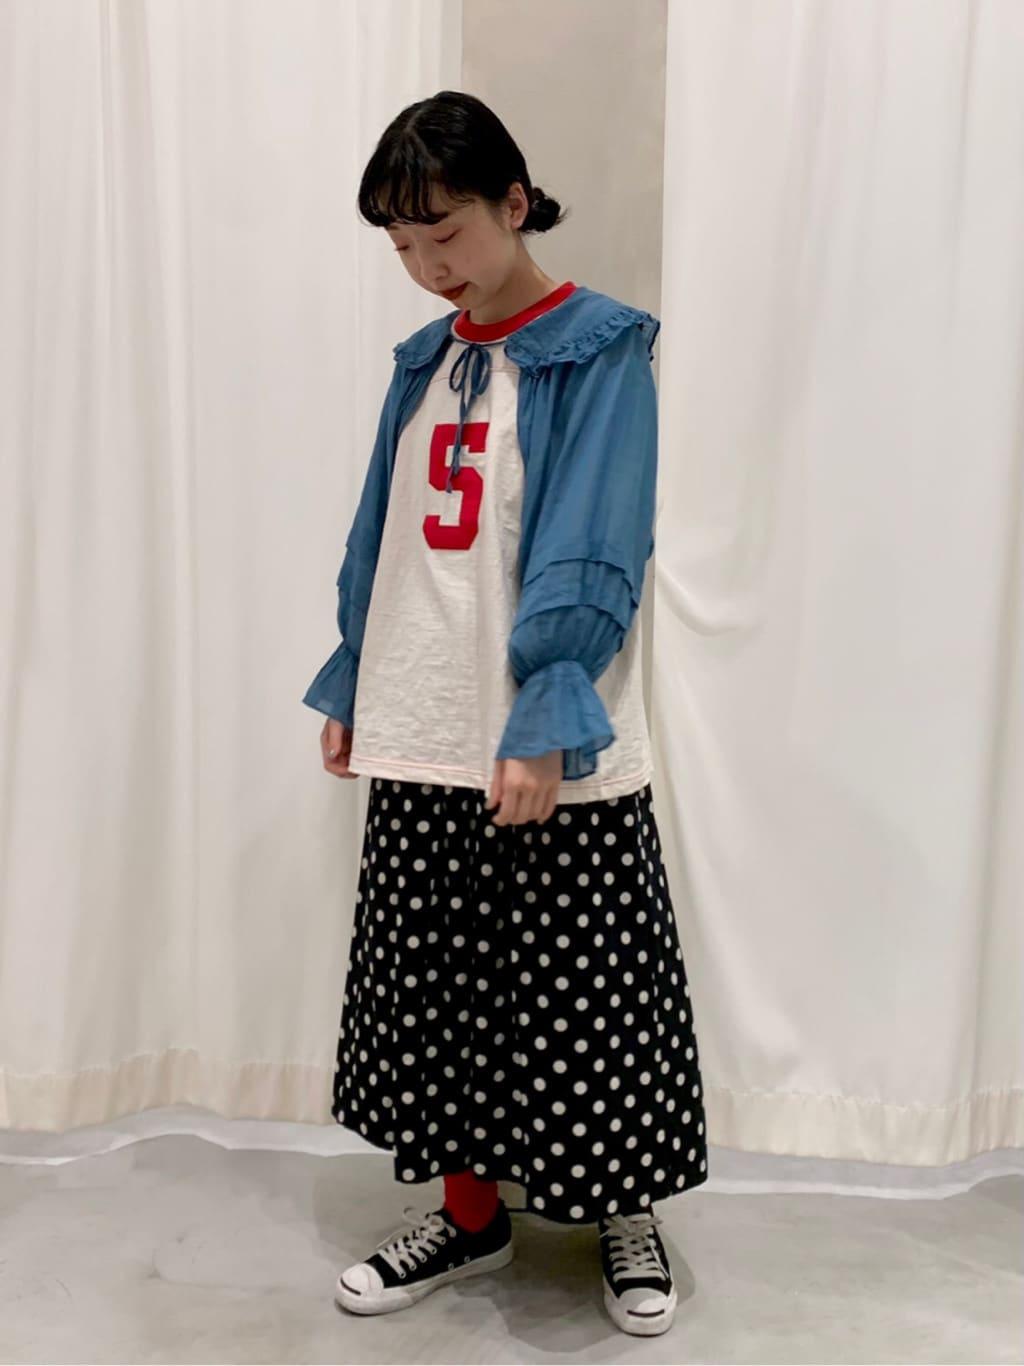 - CHILD WOMAN CHILD WOMAN , PAR ICI ルミネ横浜 身長:157cm 2021.09.16